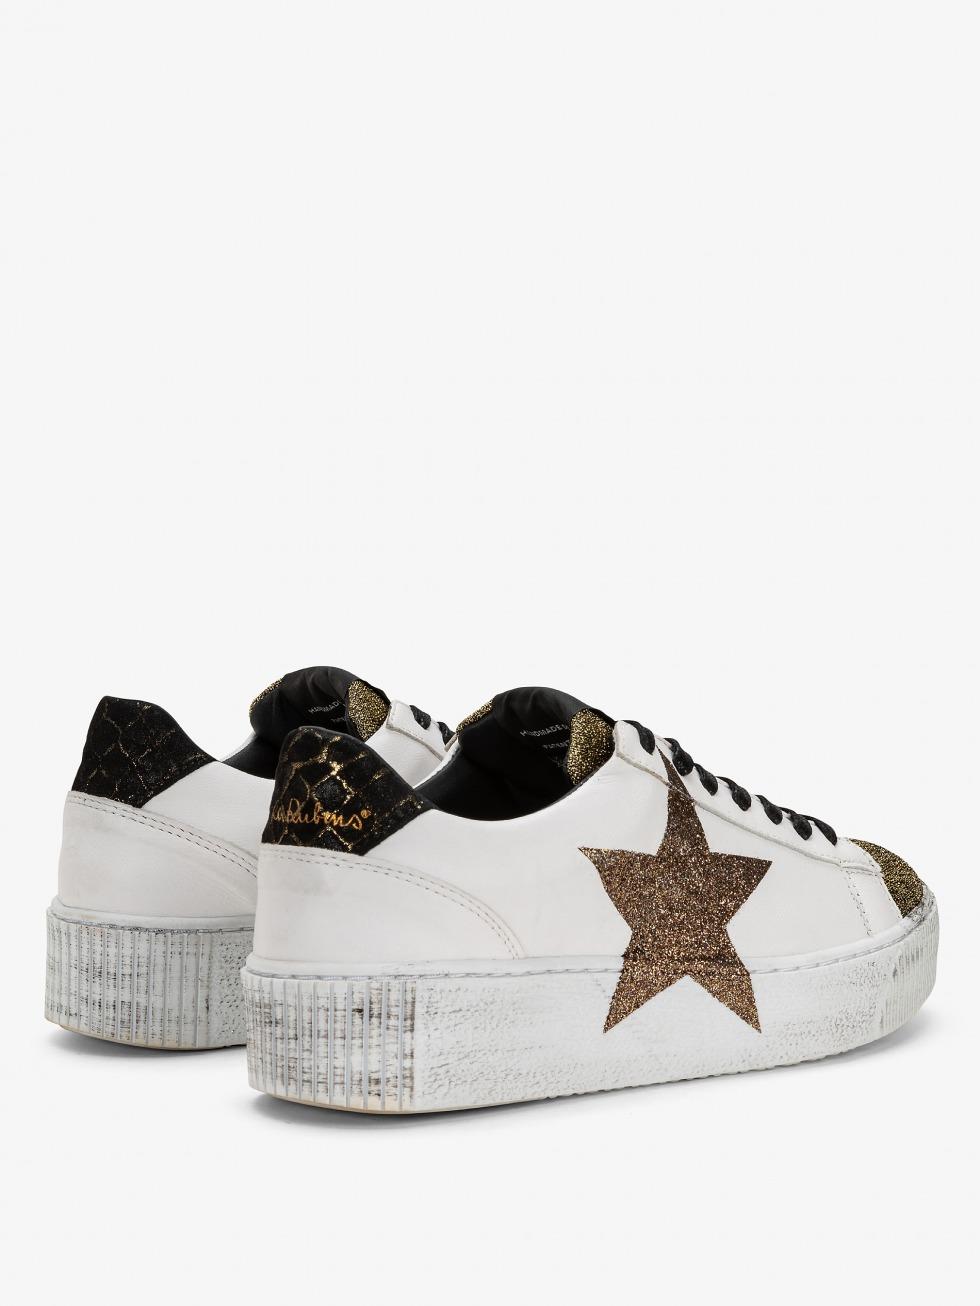 Cosmopolitan Sneakers - Glam Gold Glitter Star